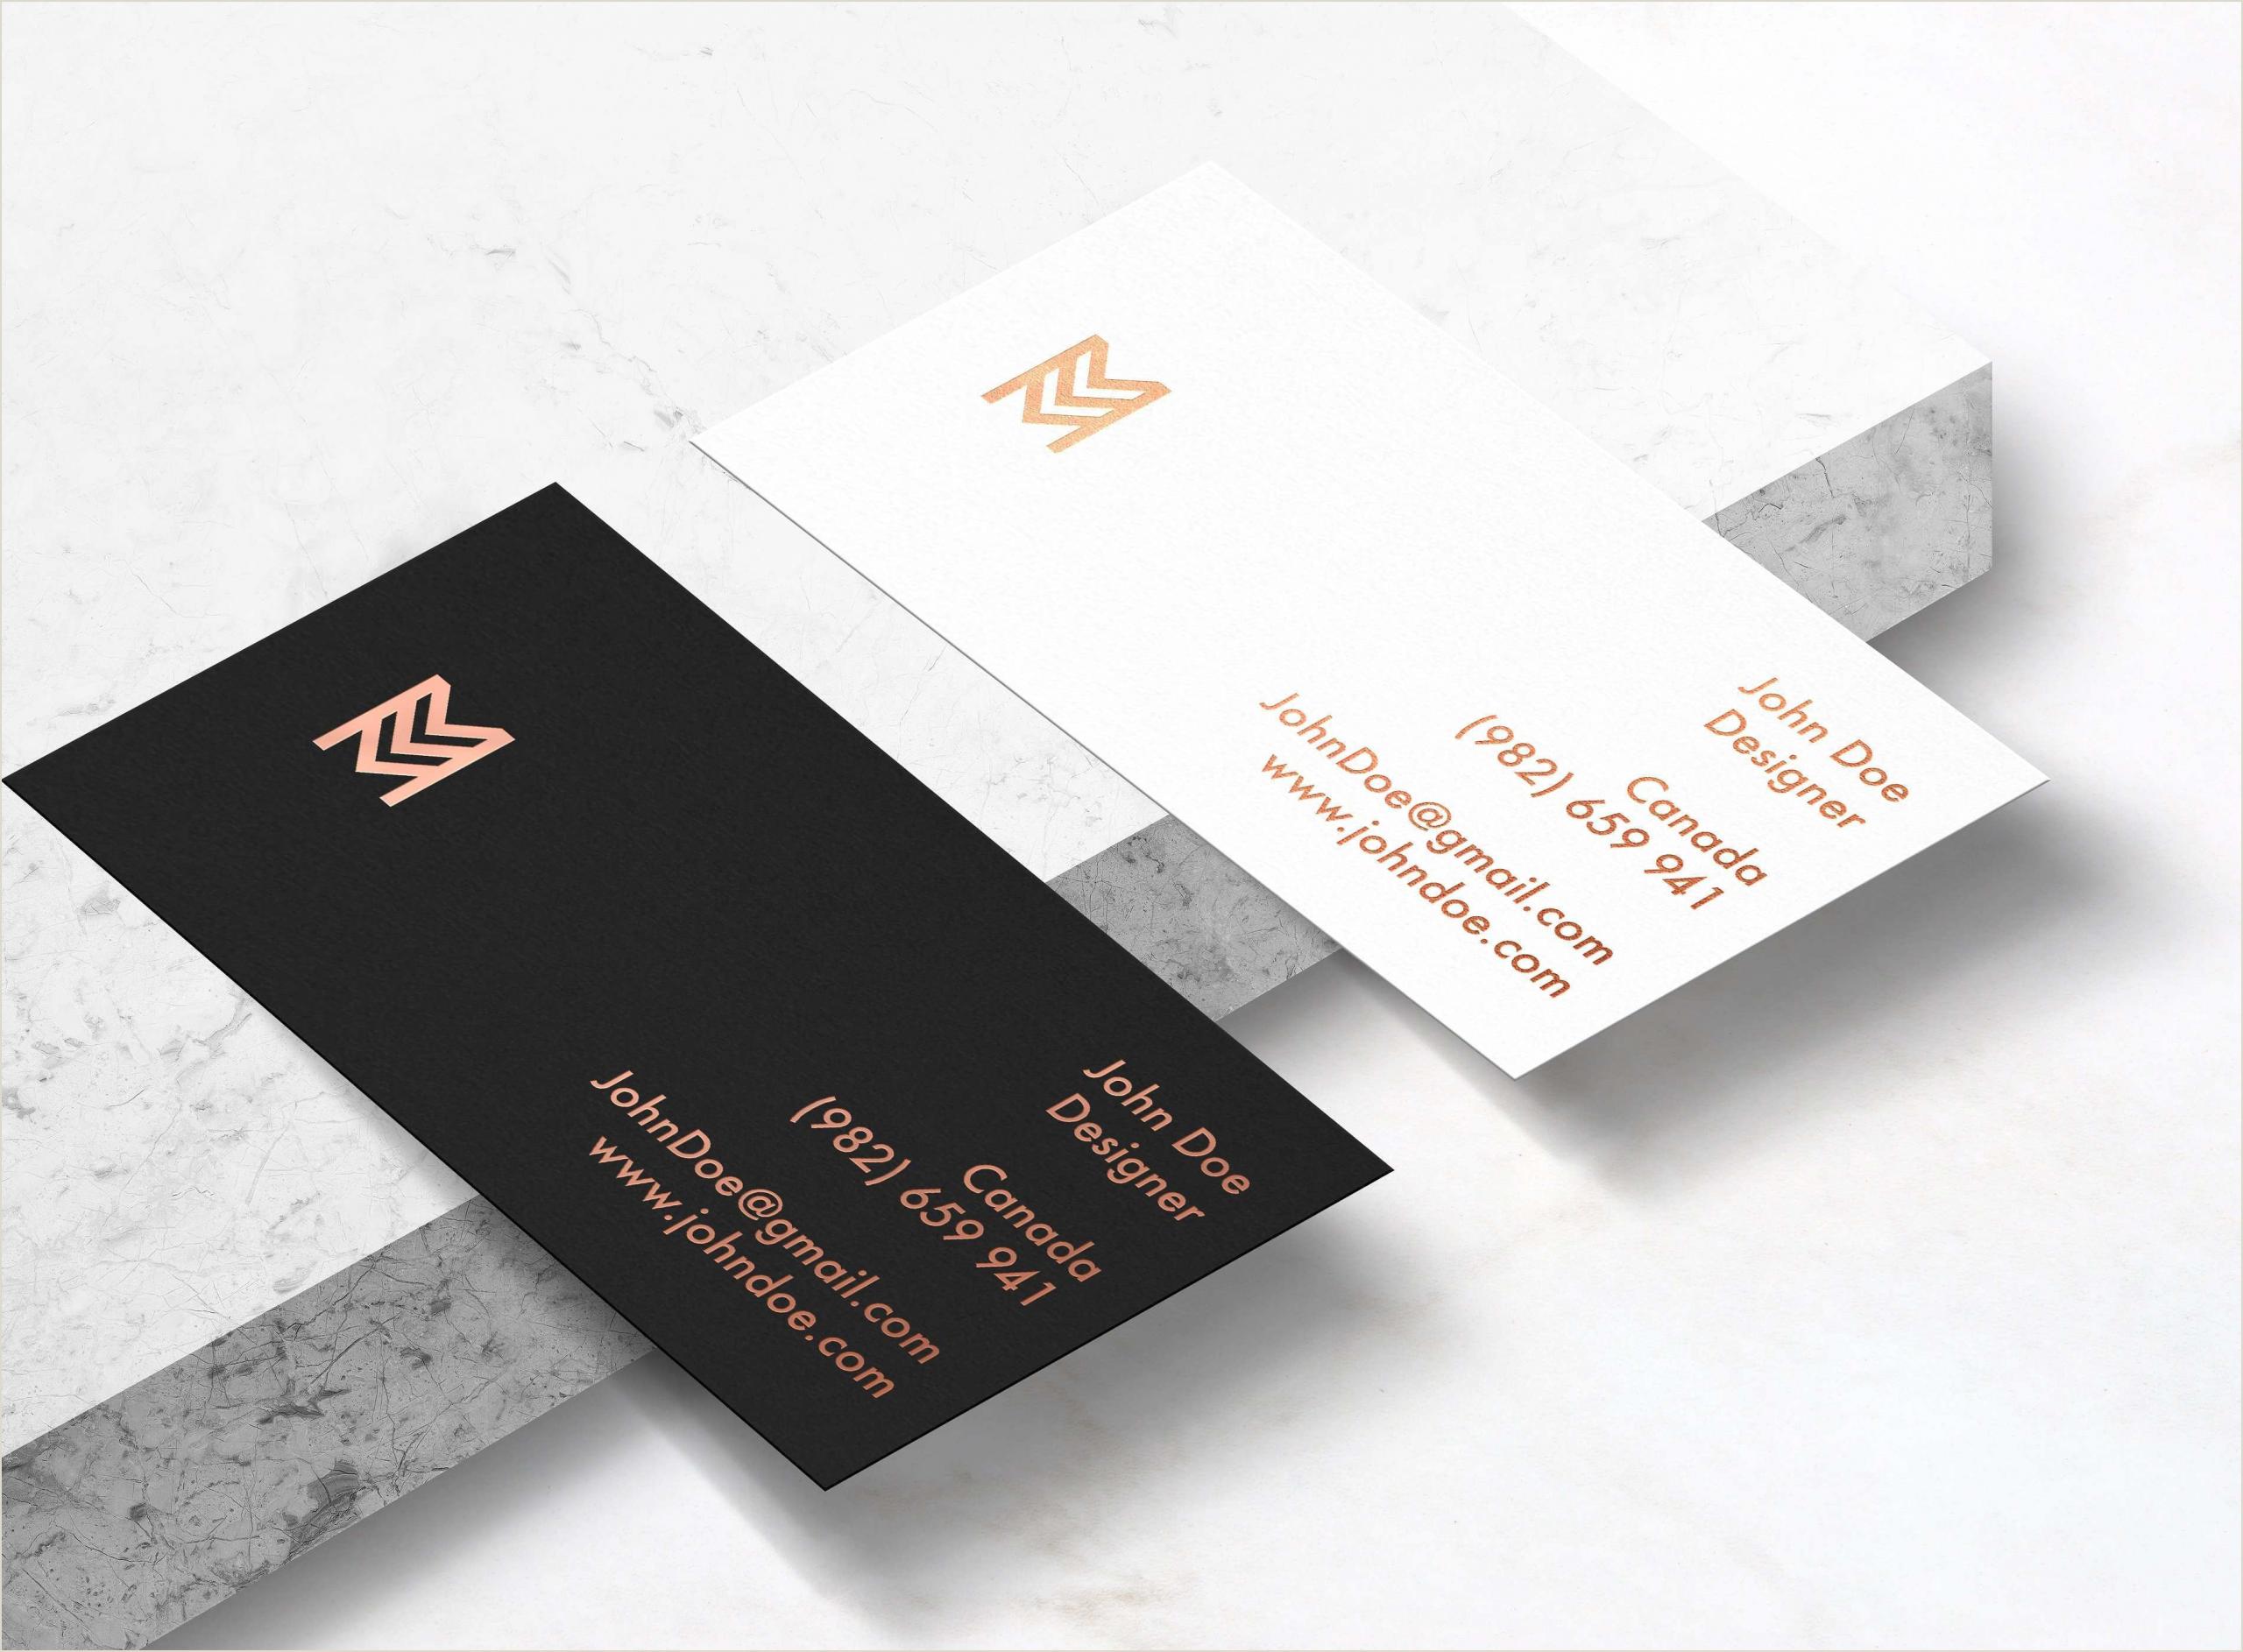 Best Business Cards Vistaprint Editors Choice Business Card Template Shop Vistaprint